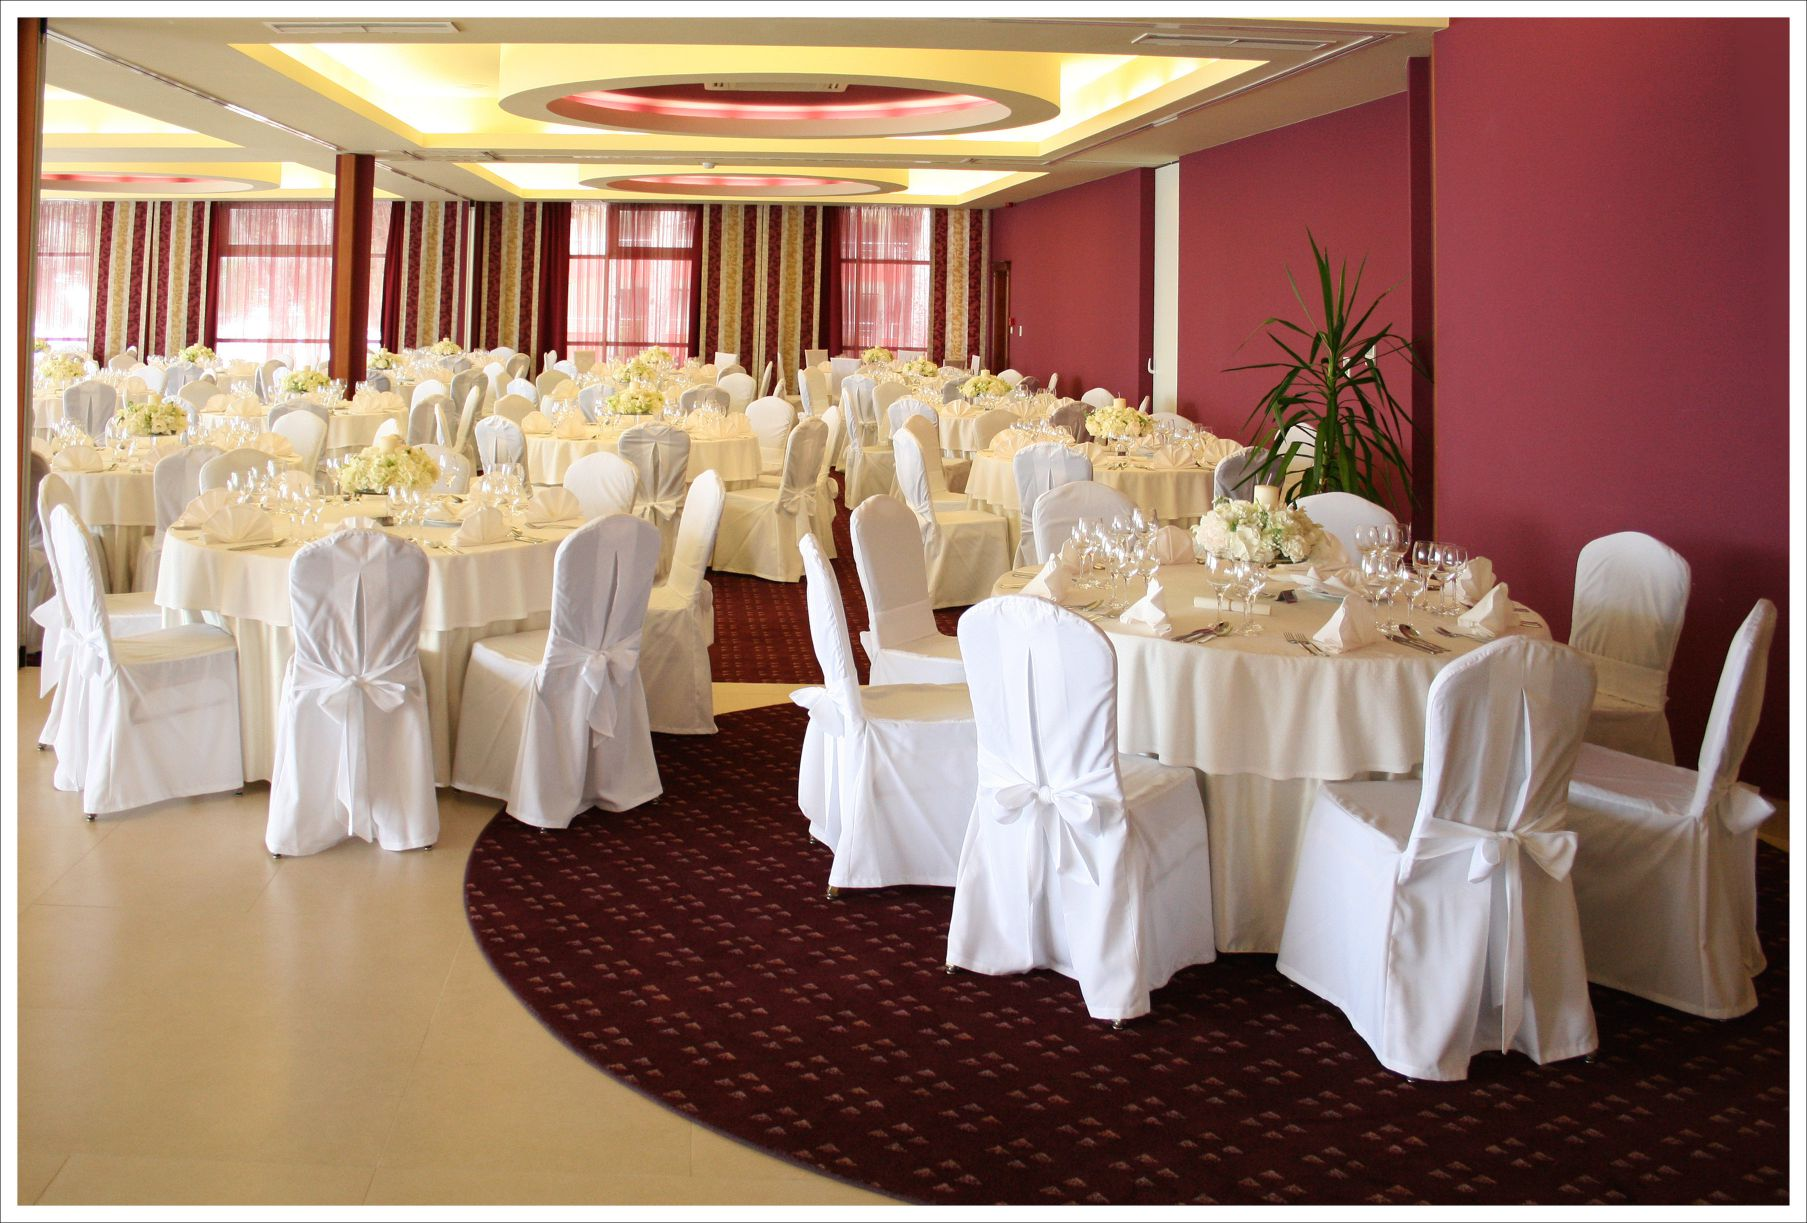 congress center gala dinner 07 14823037101 o - Zora Hotel